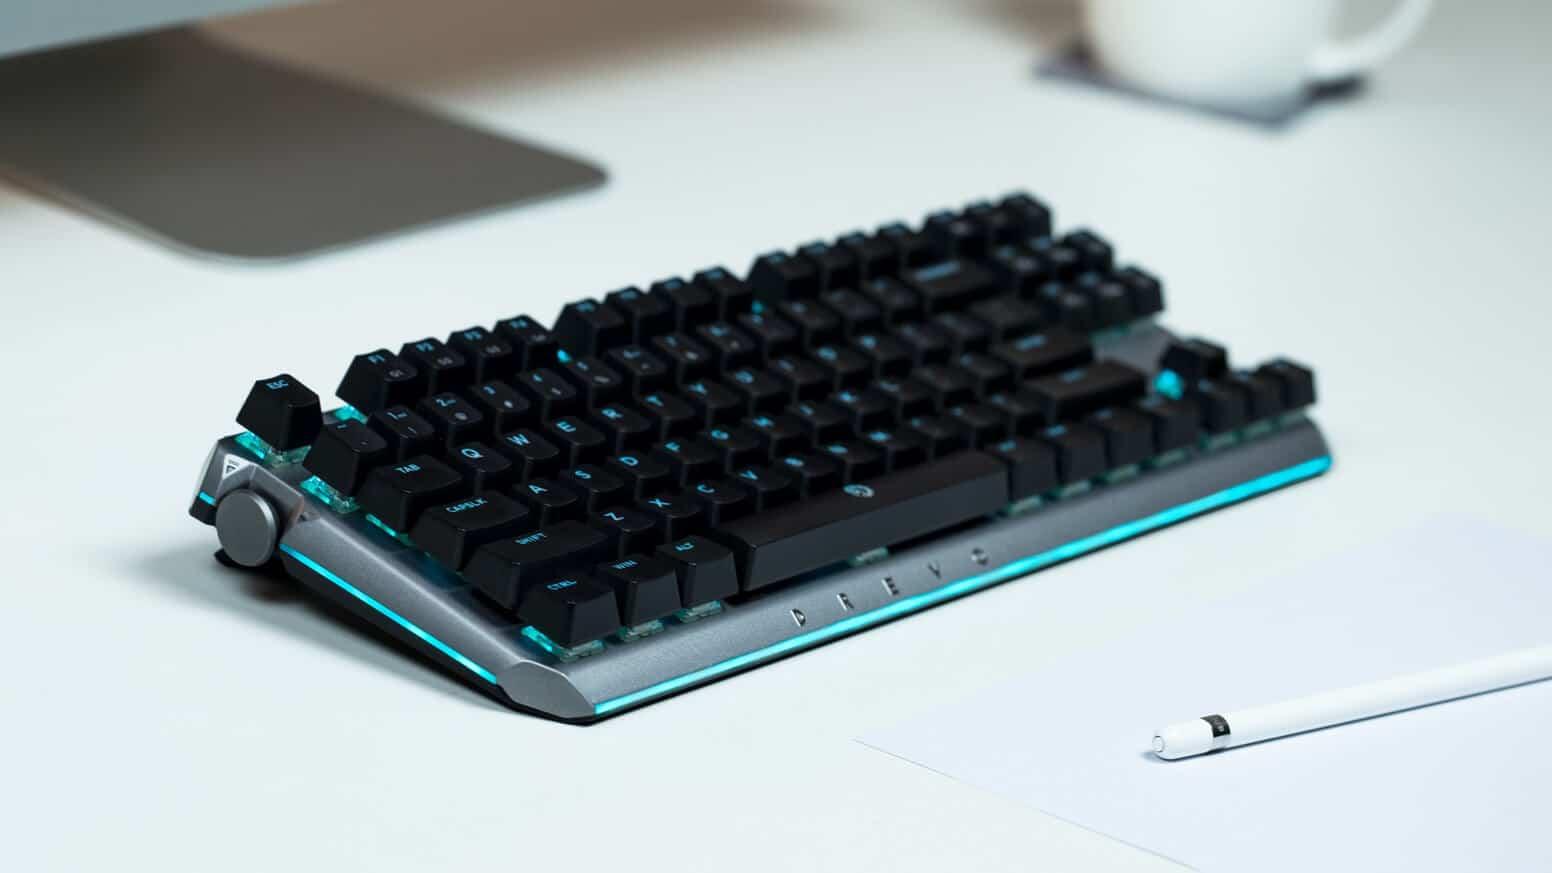 DREVO is bringing a wireless mechanical RGB keyboard to market